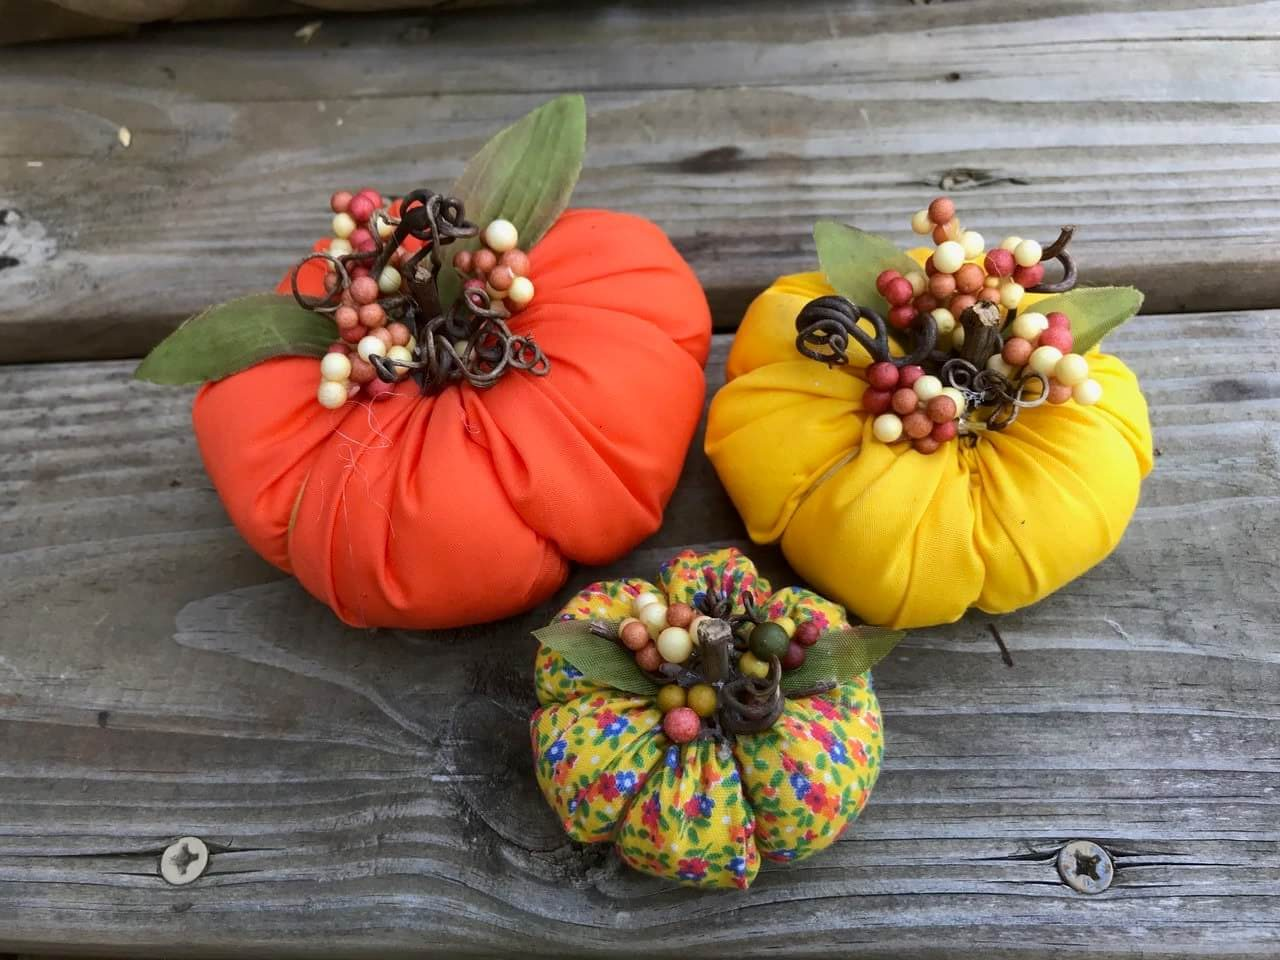 How To Make A Fabric Pumpkin With Cricut Maker